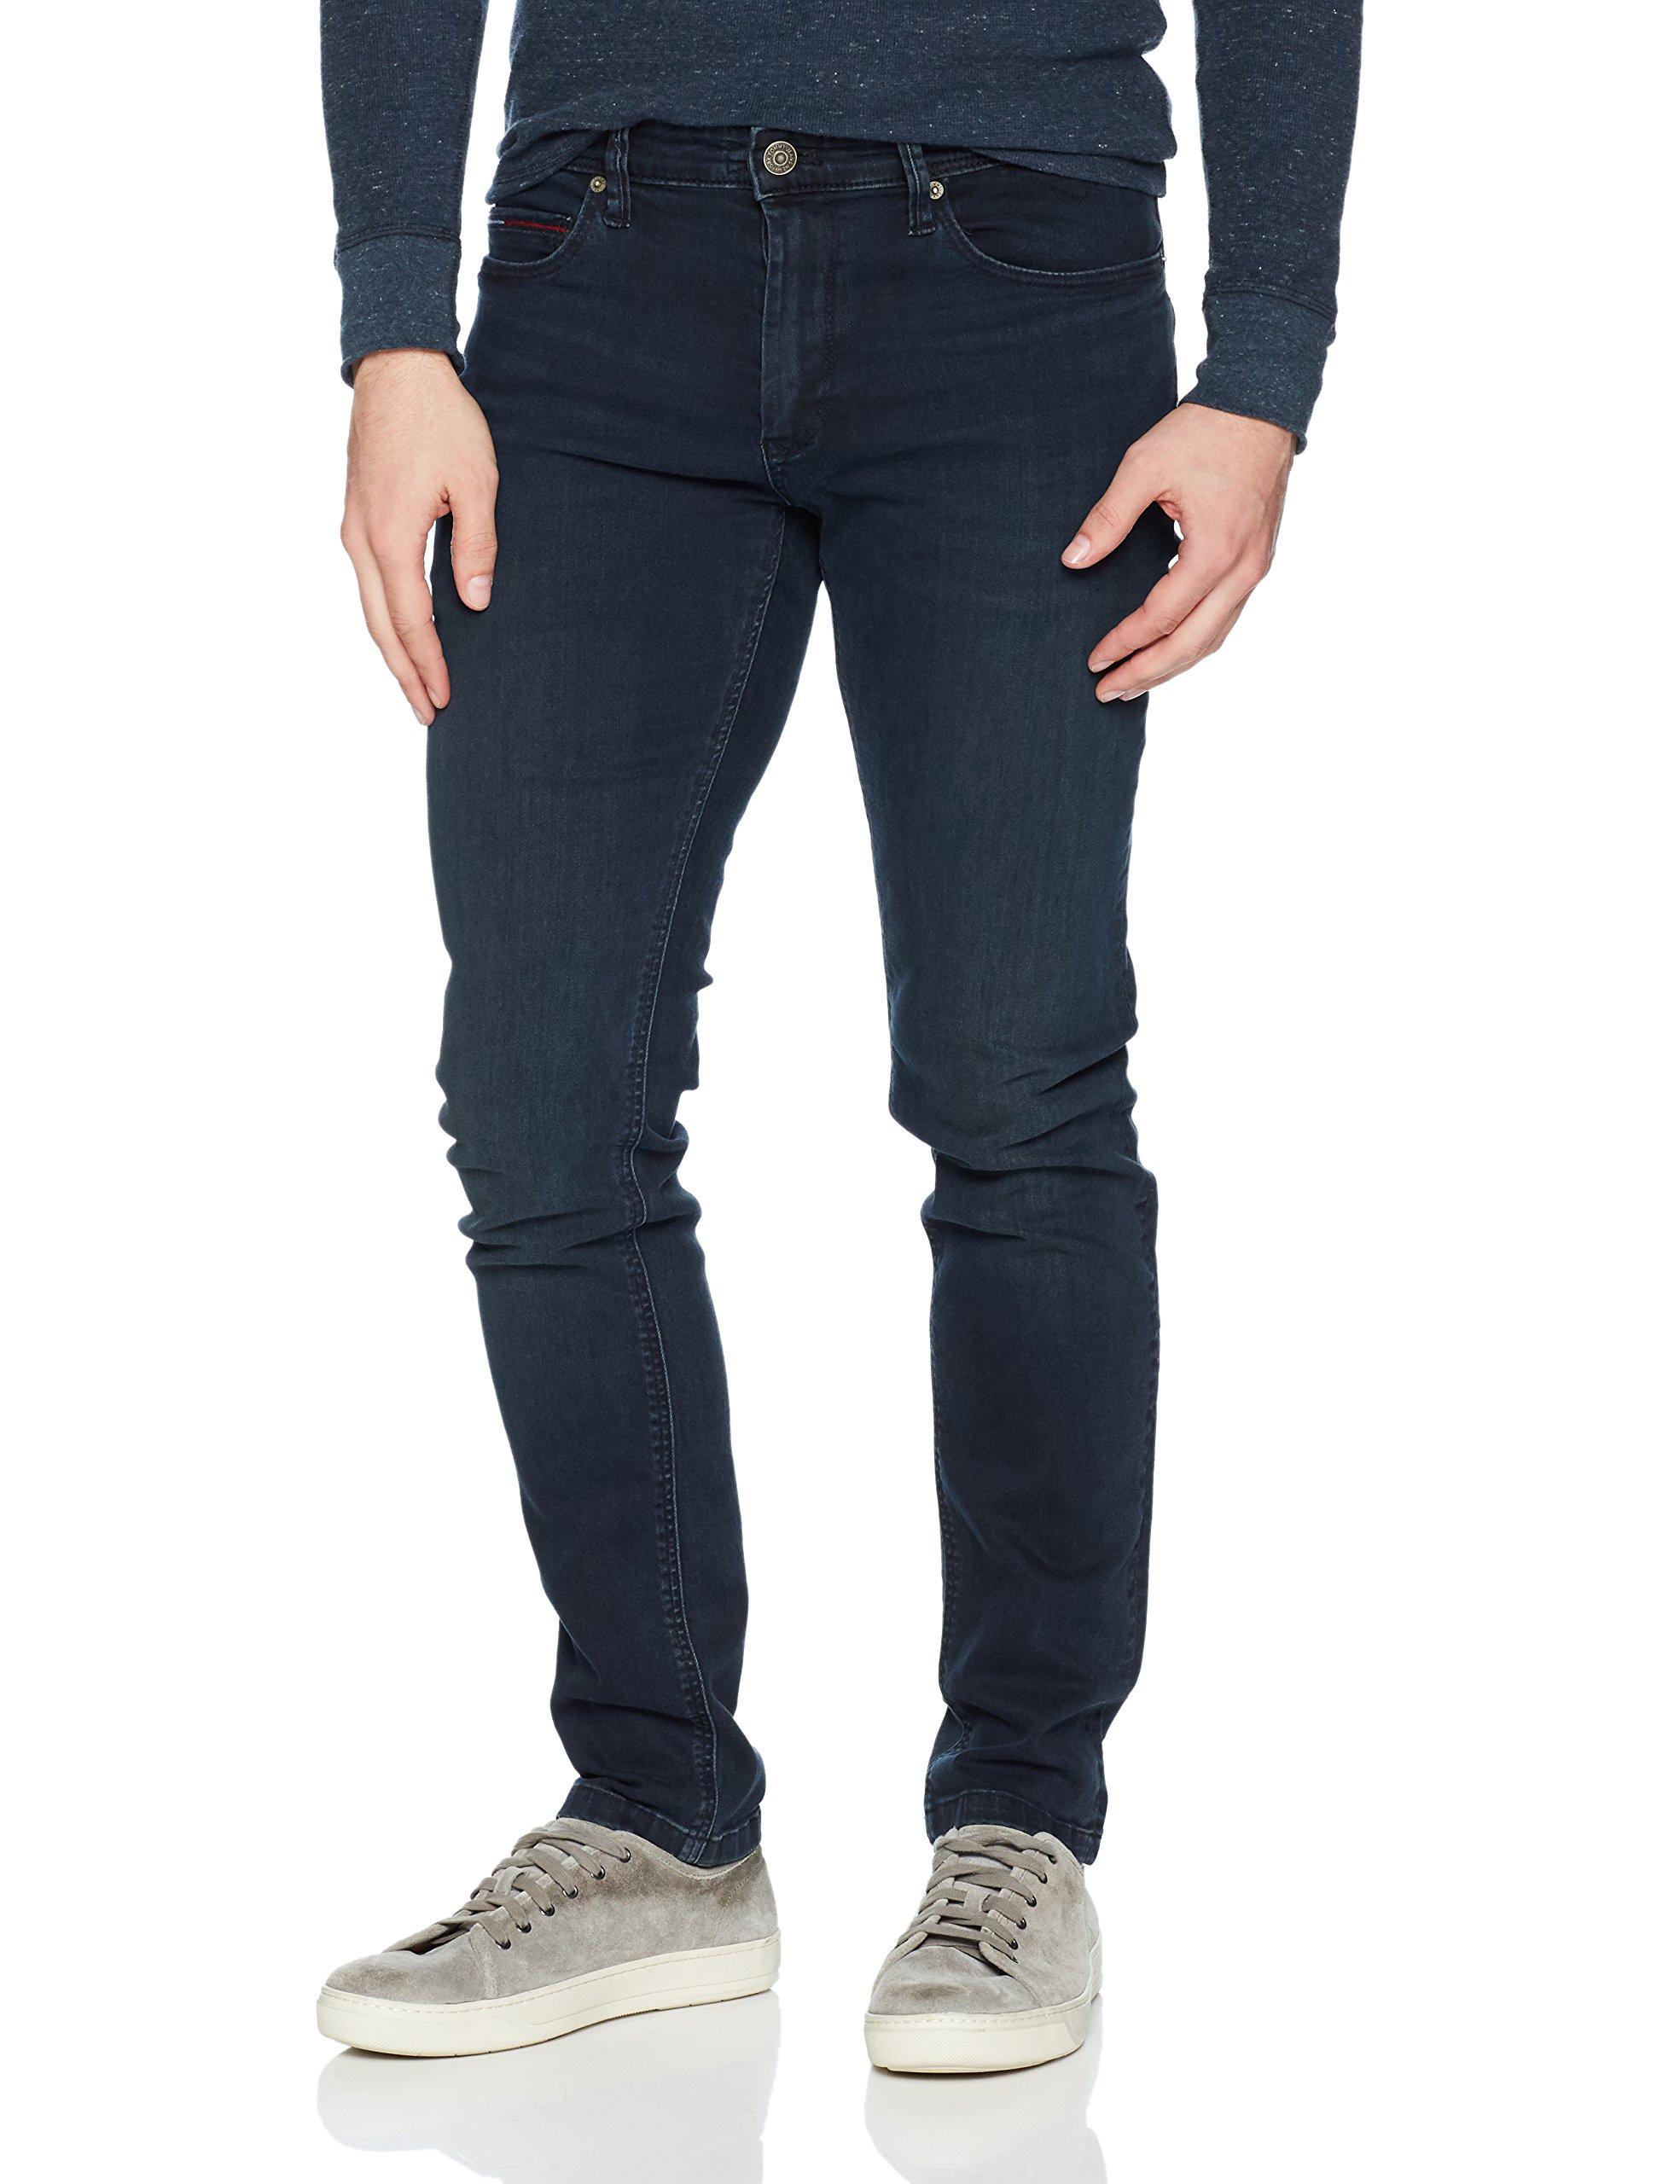 19043df9c Get Quotations · Tommy Hilfiger Men's Original Steve Slim Athletic Fit Jeans